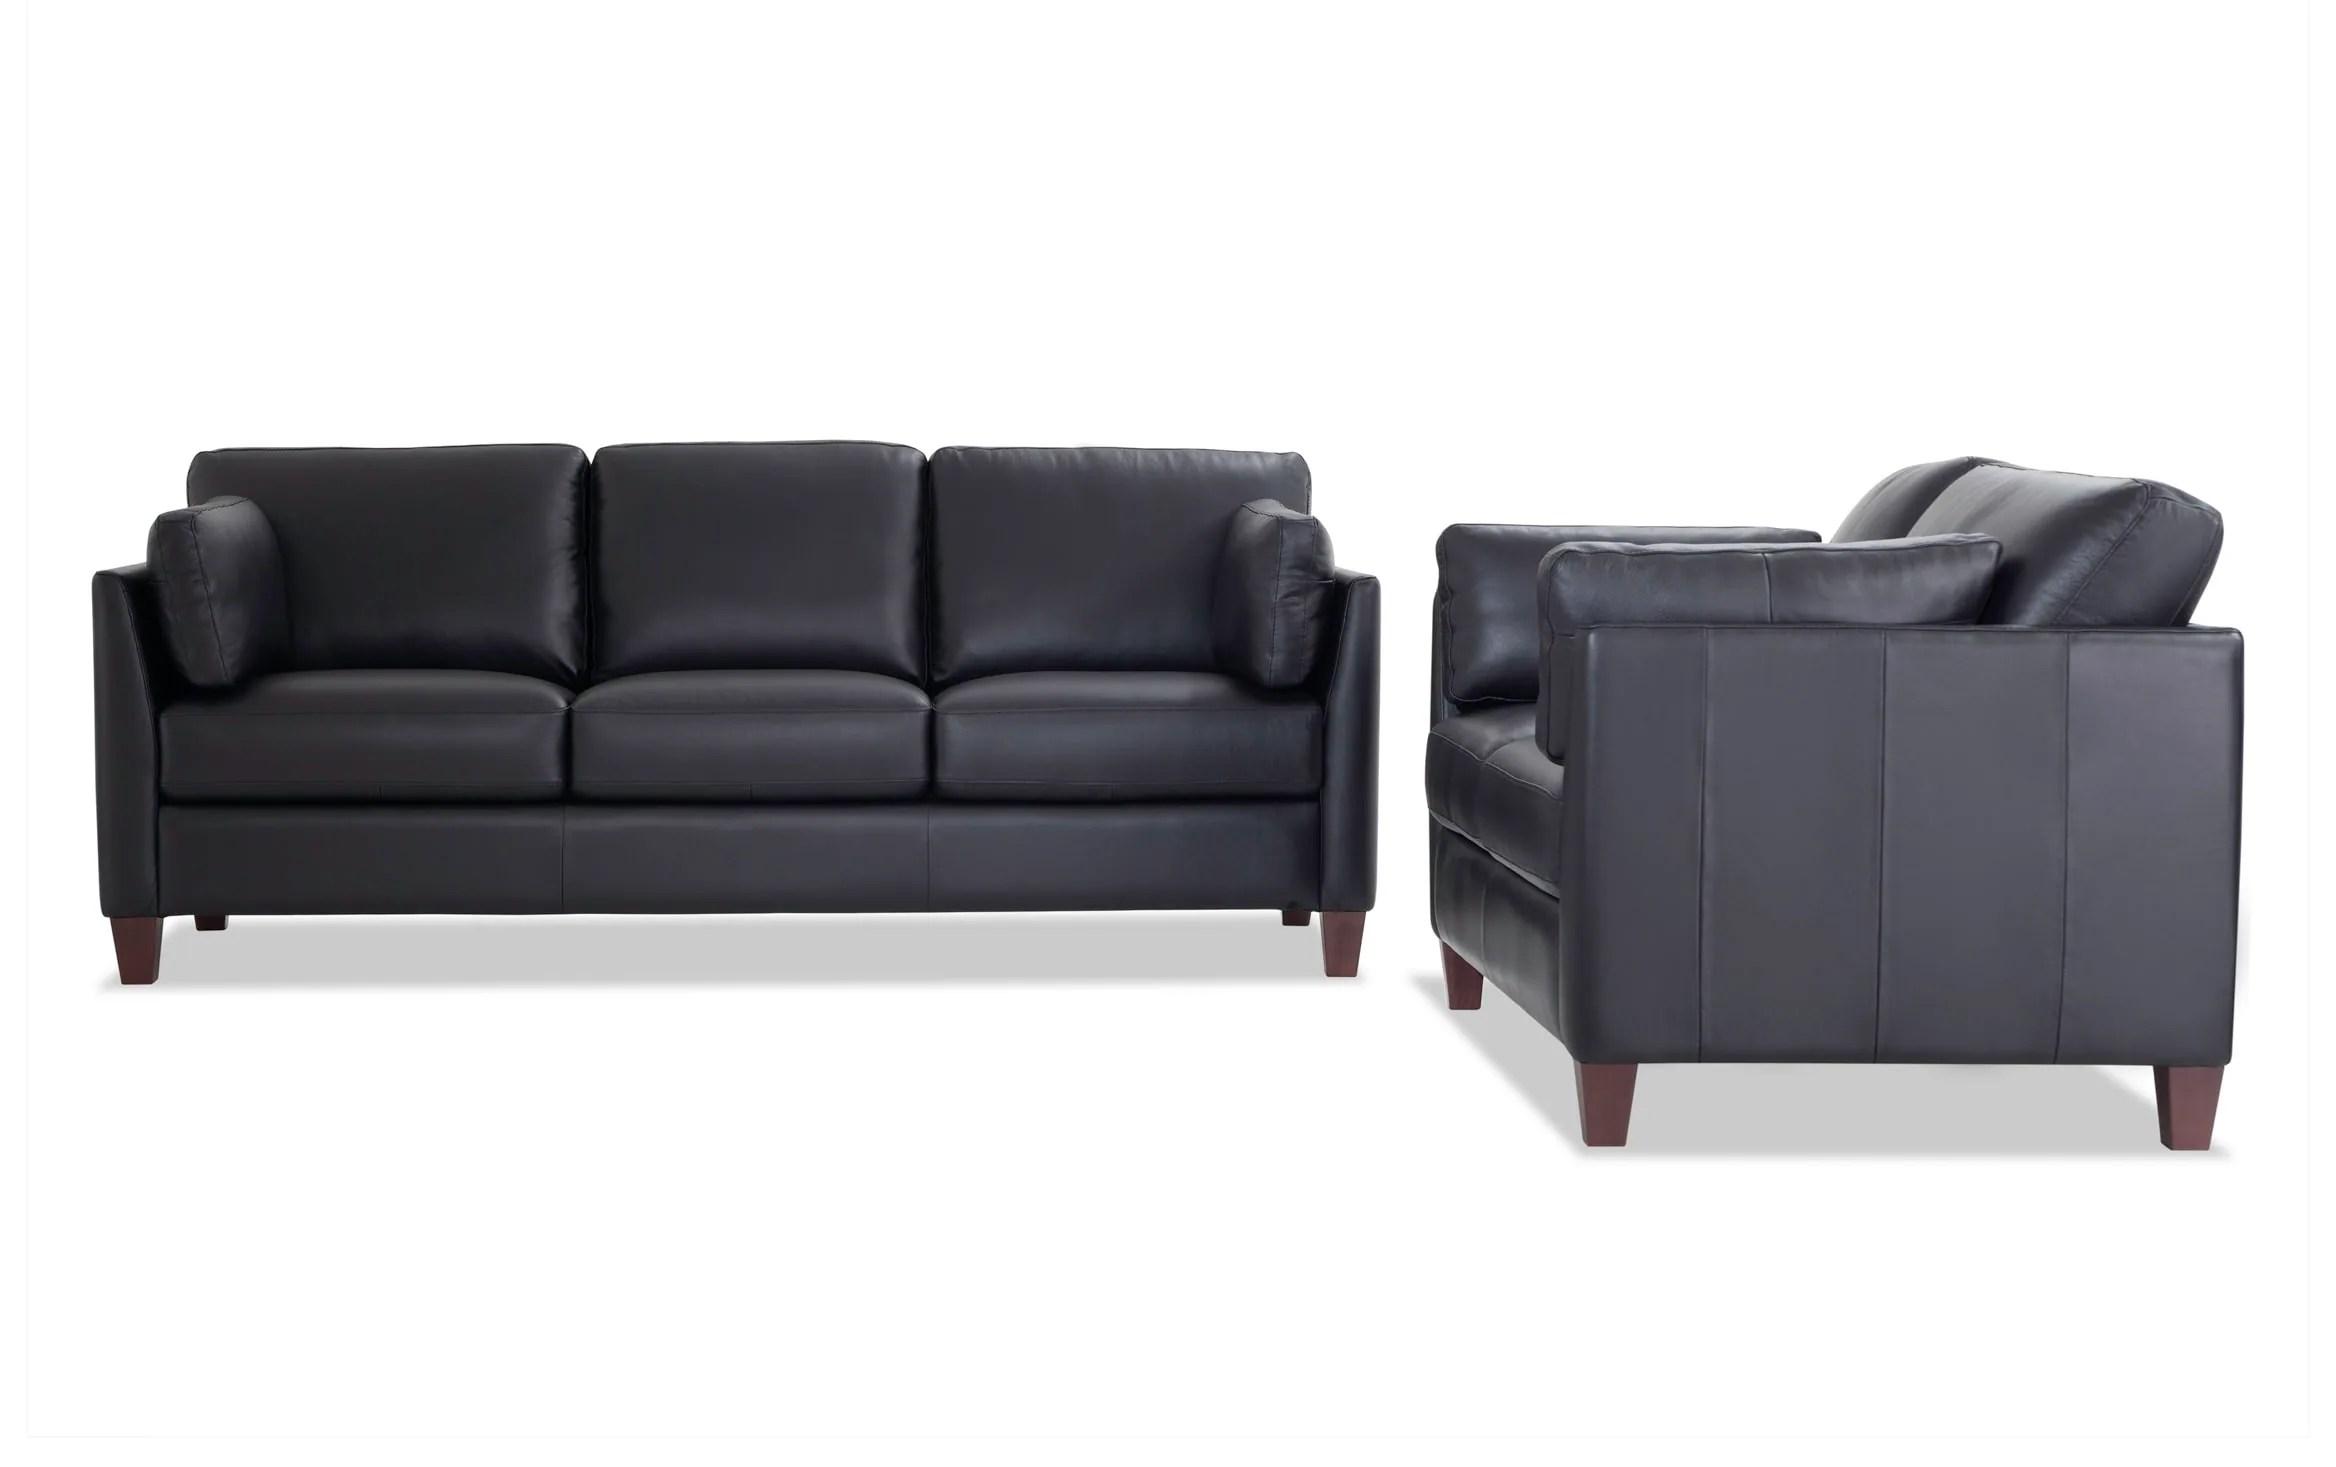 Antonio Black Leather Bob O Pedic Queen Sleeper Sofa Loveseat Bobs Com